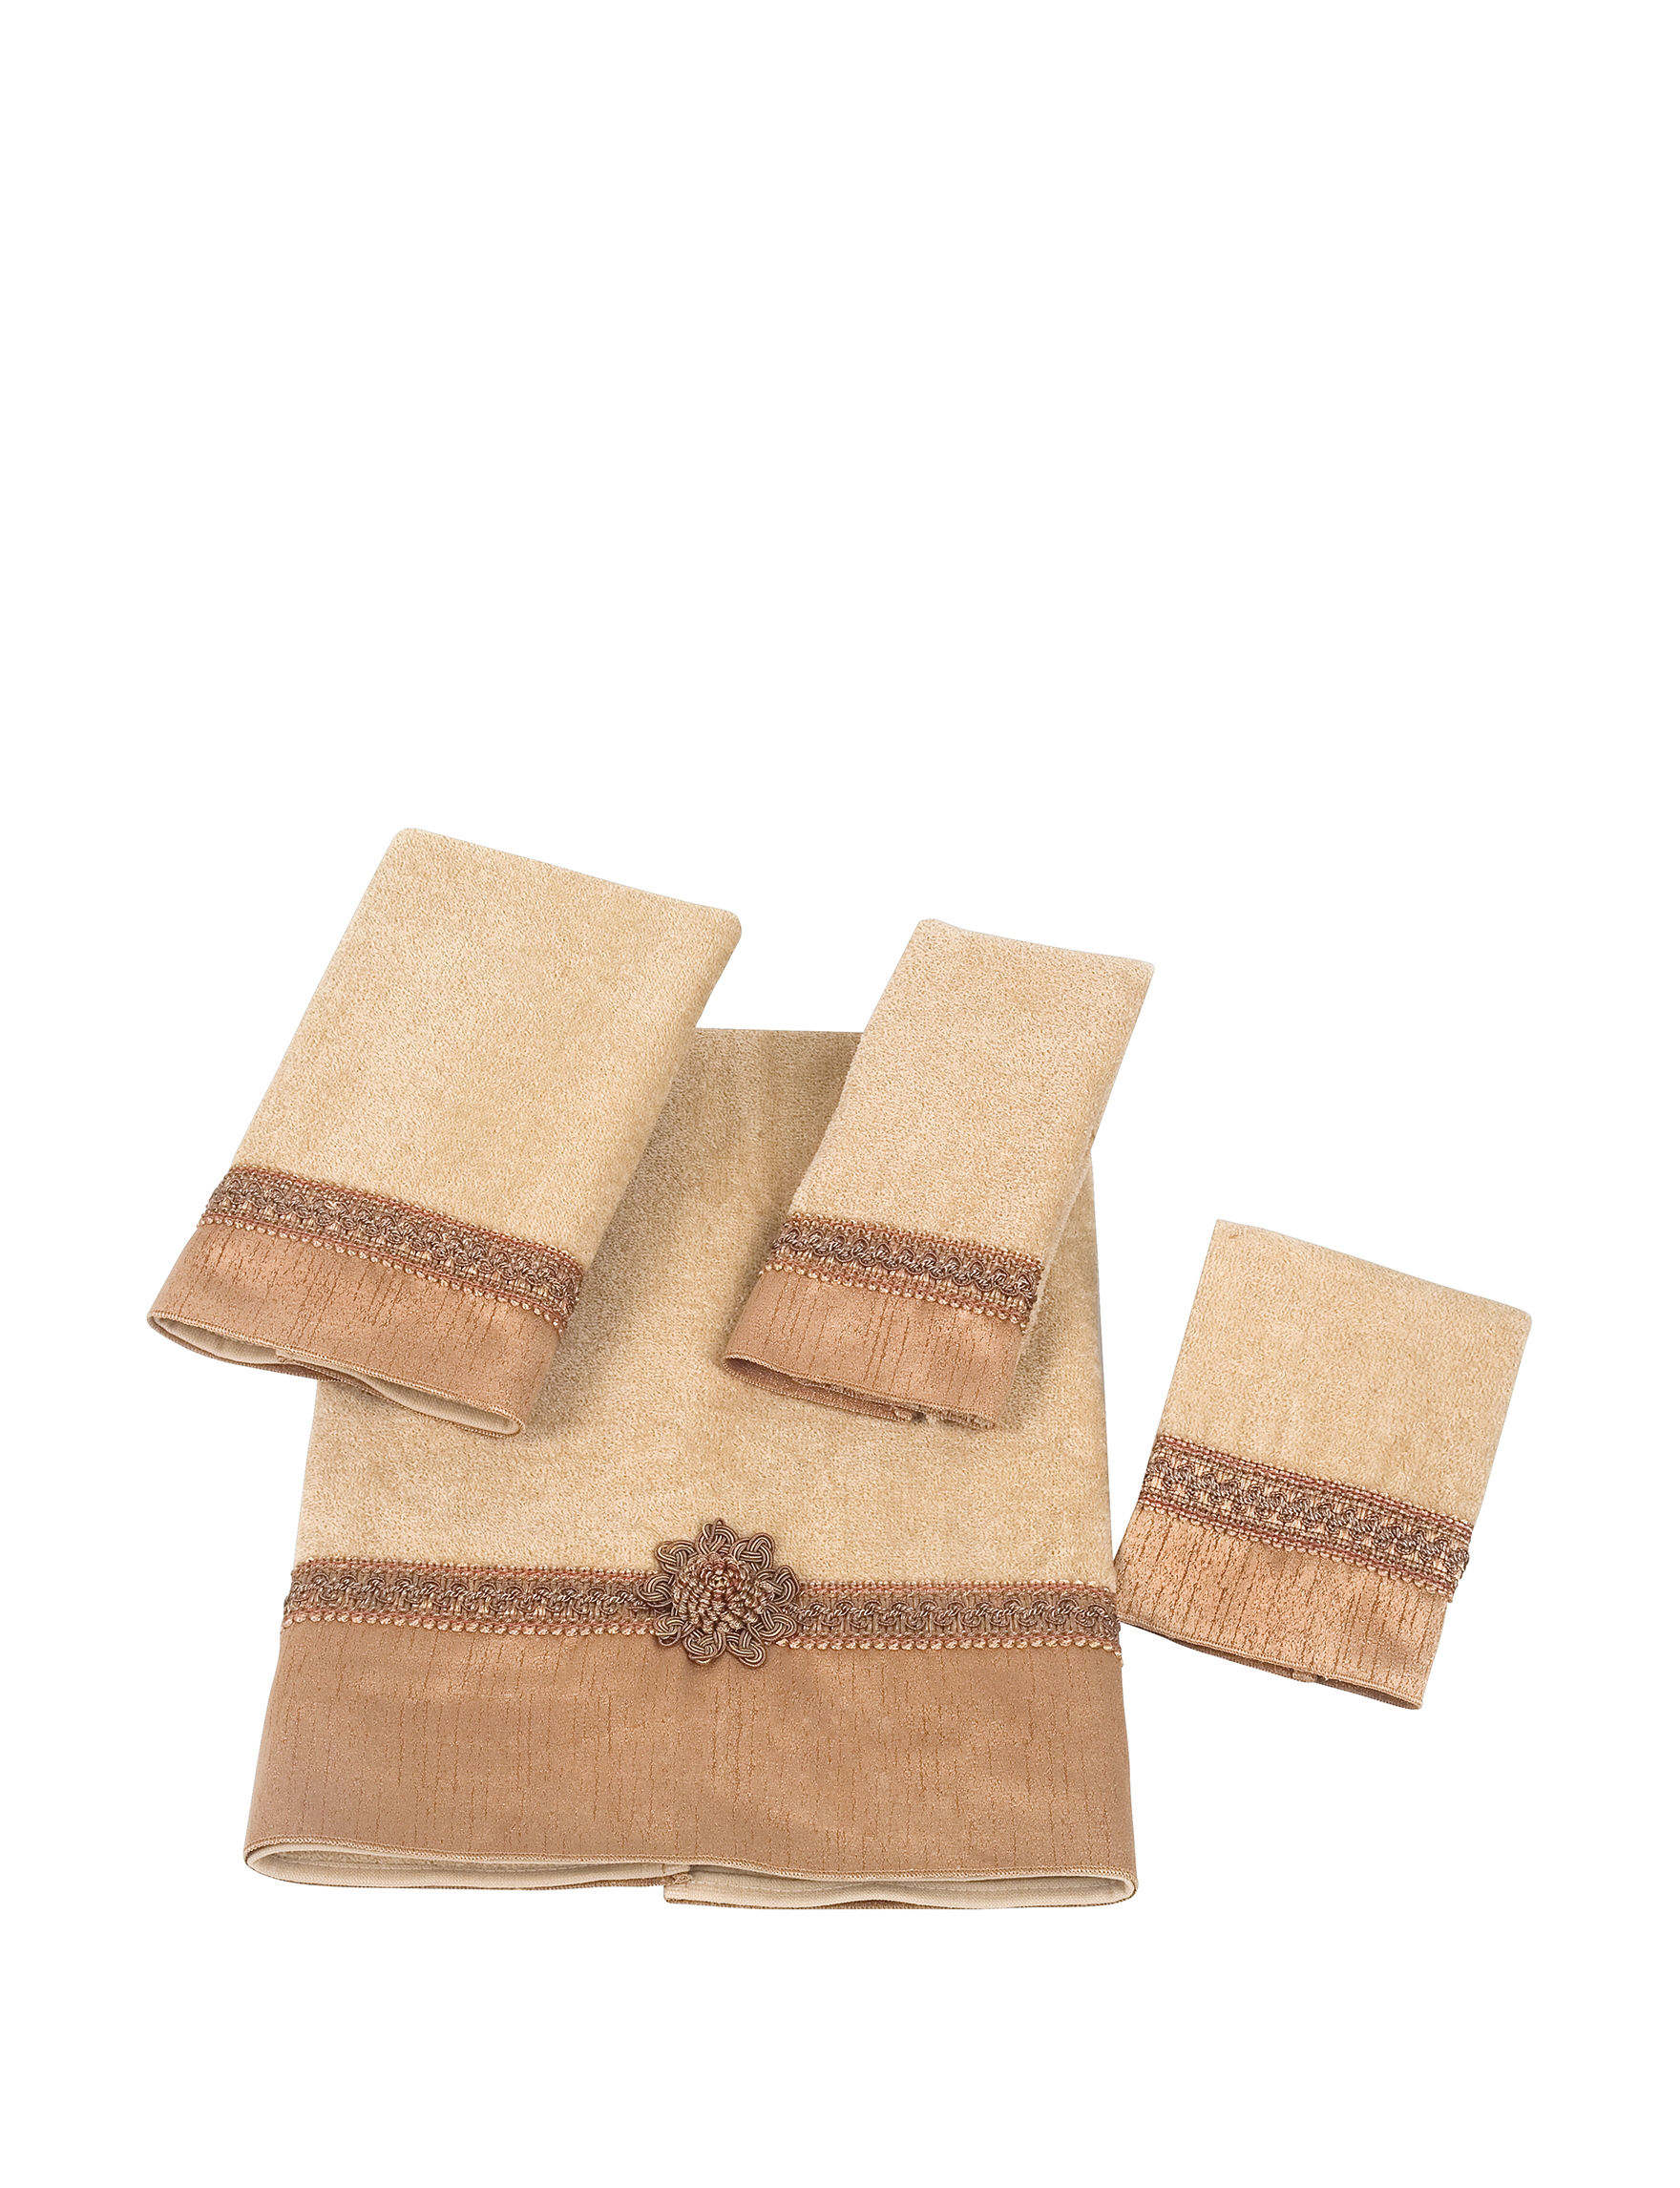 Avanti Beige Bath Towels Hand Towels Washcloths